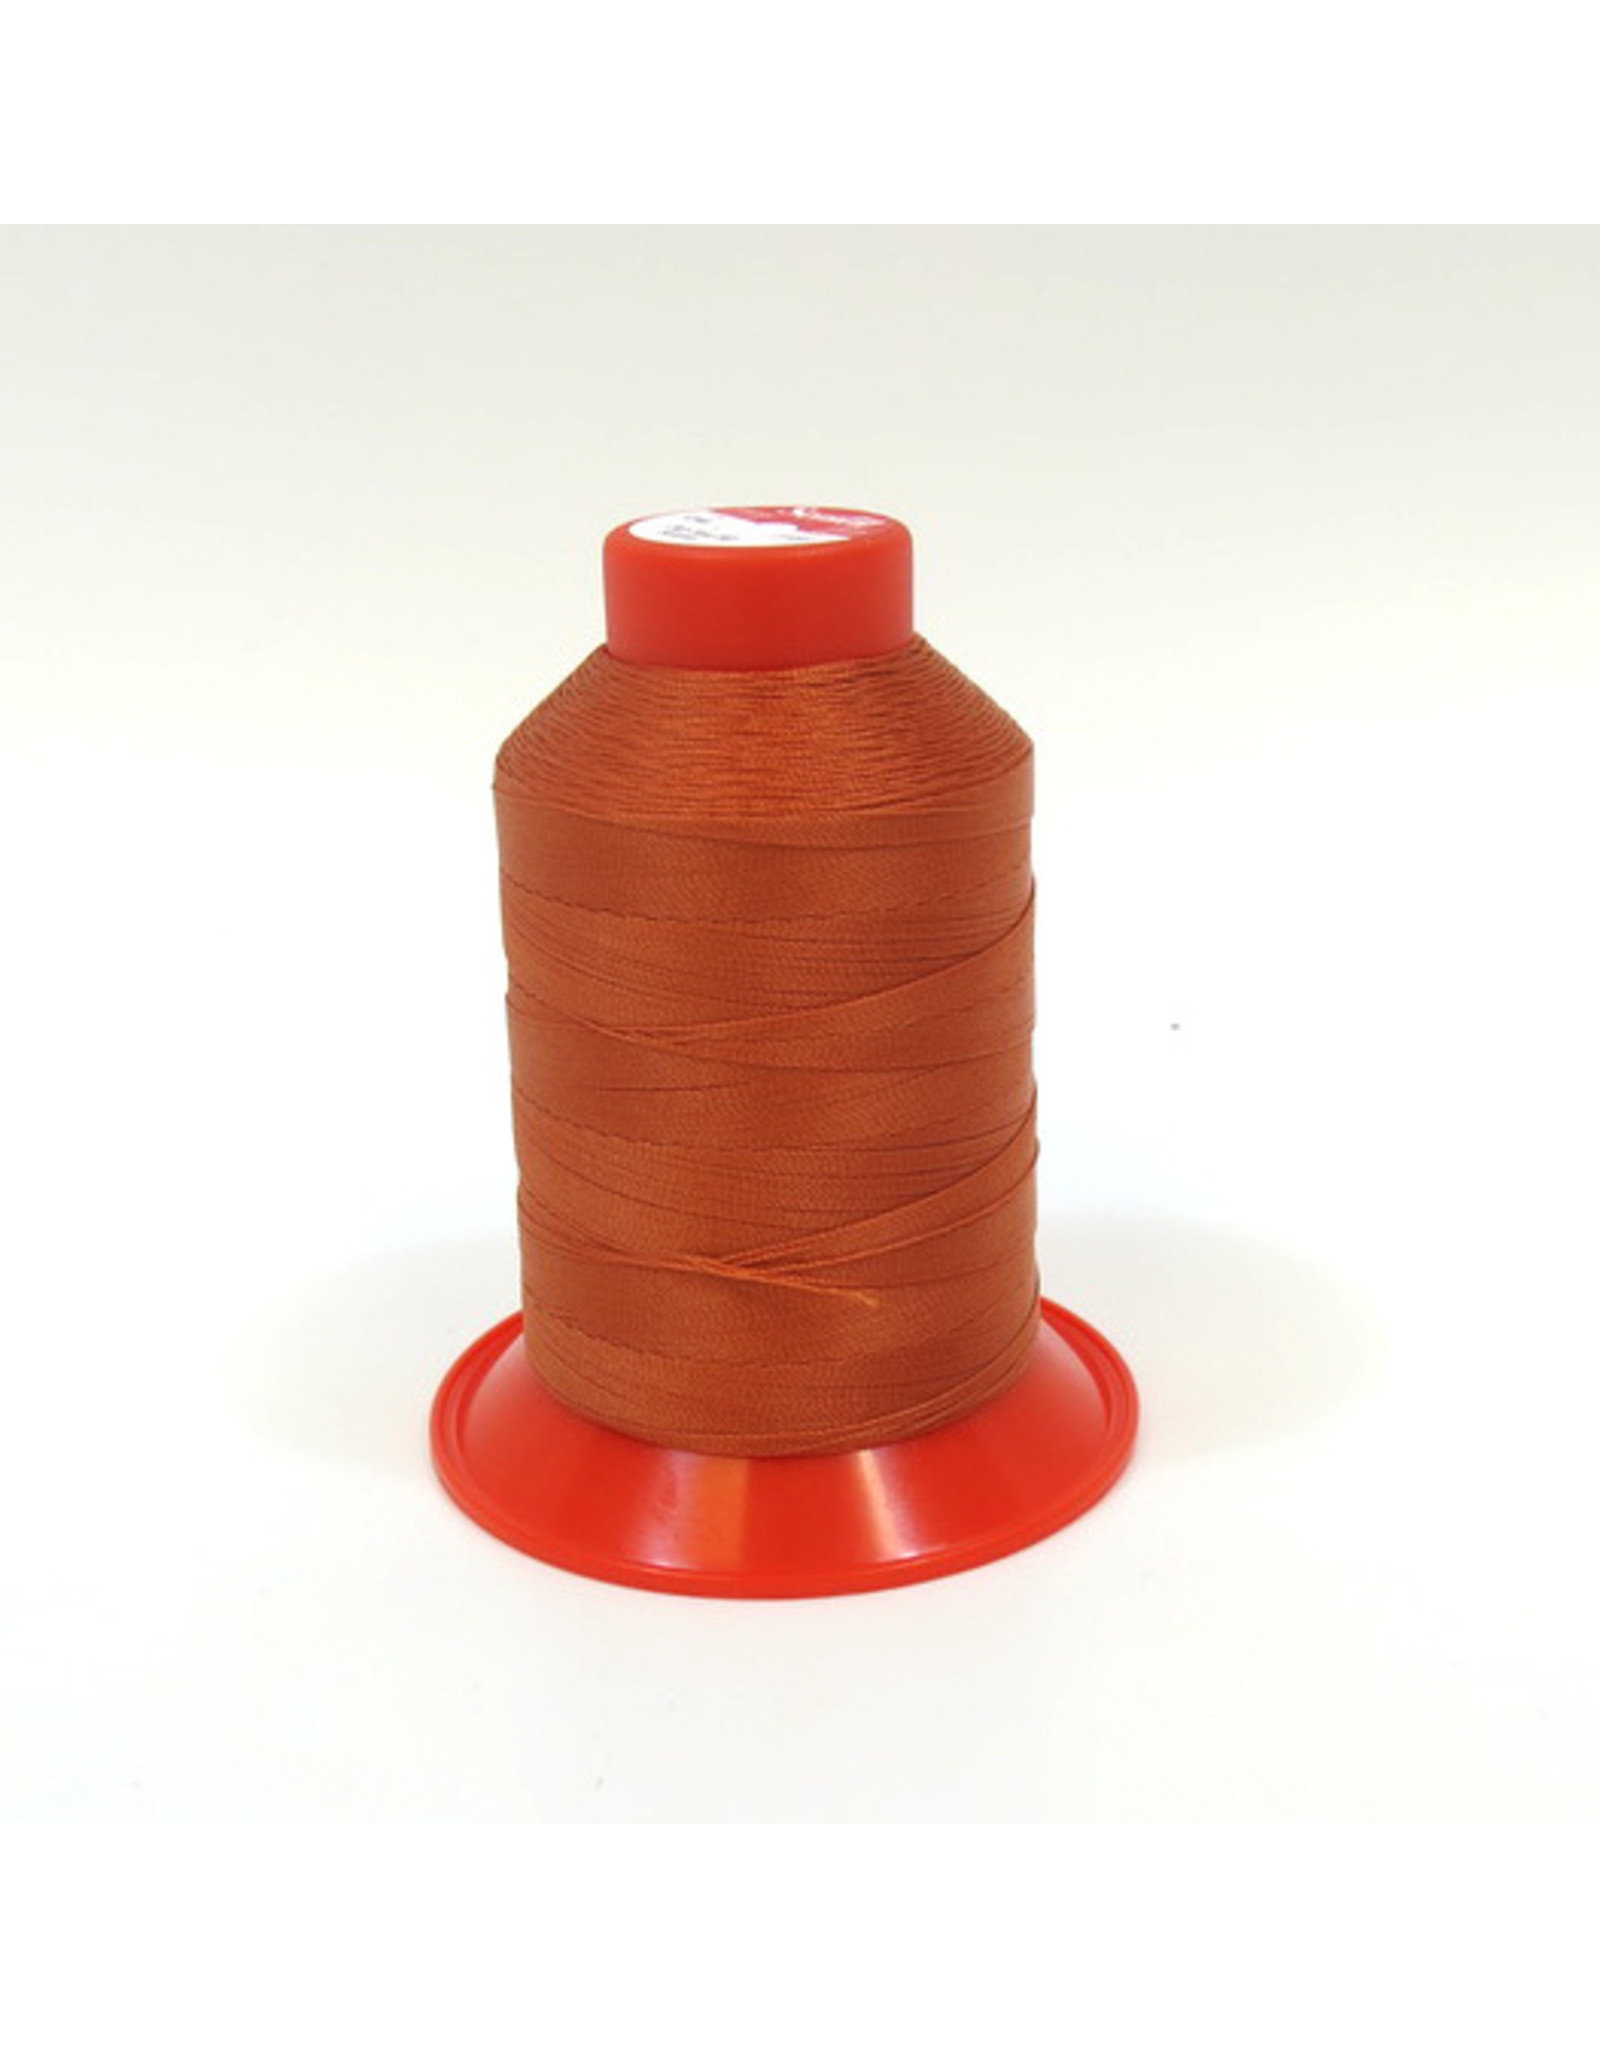 Serafil machine sewing thread 1288